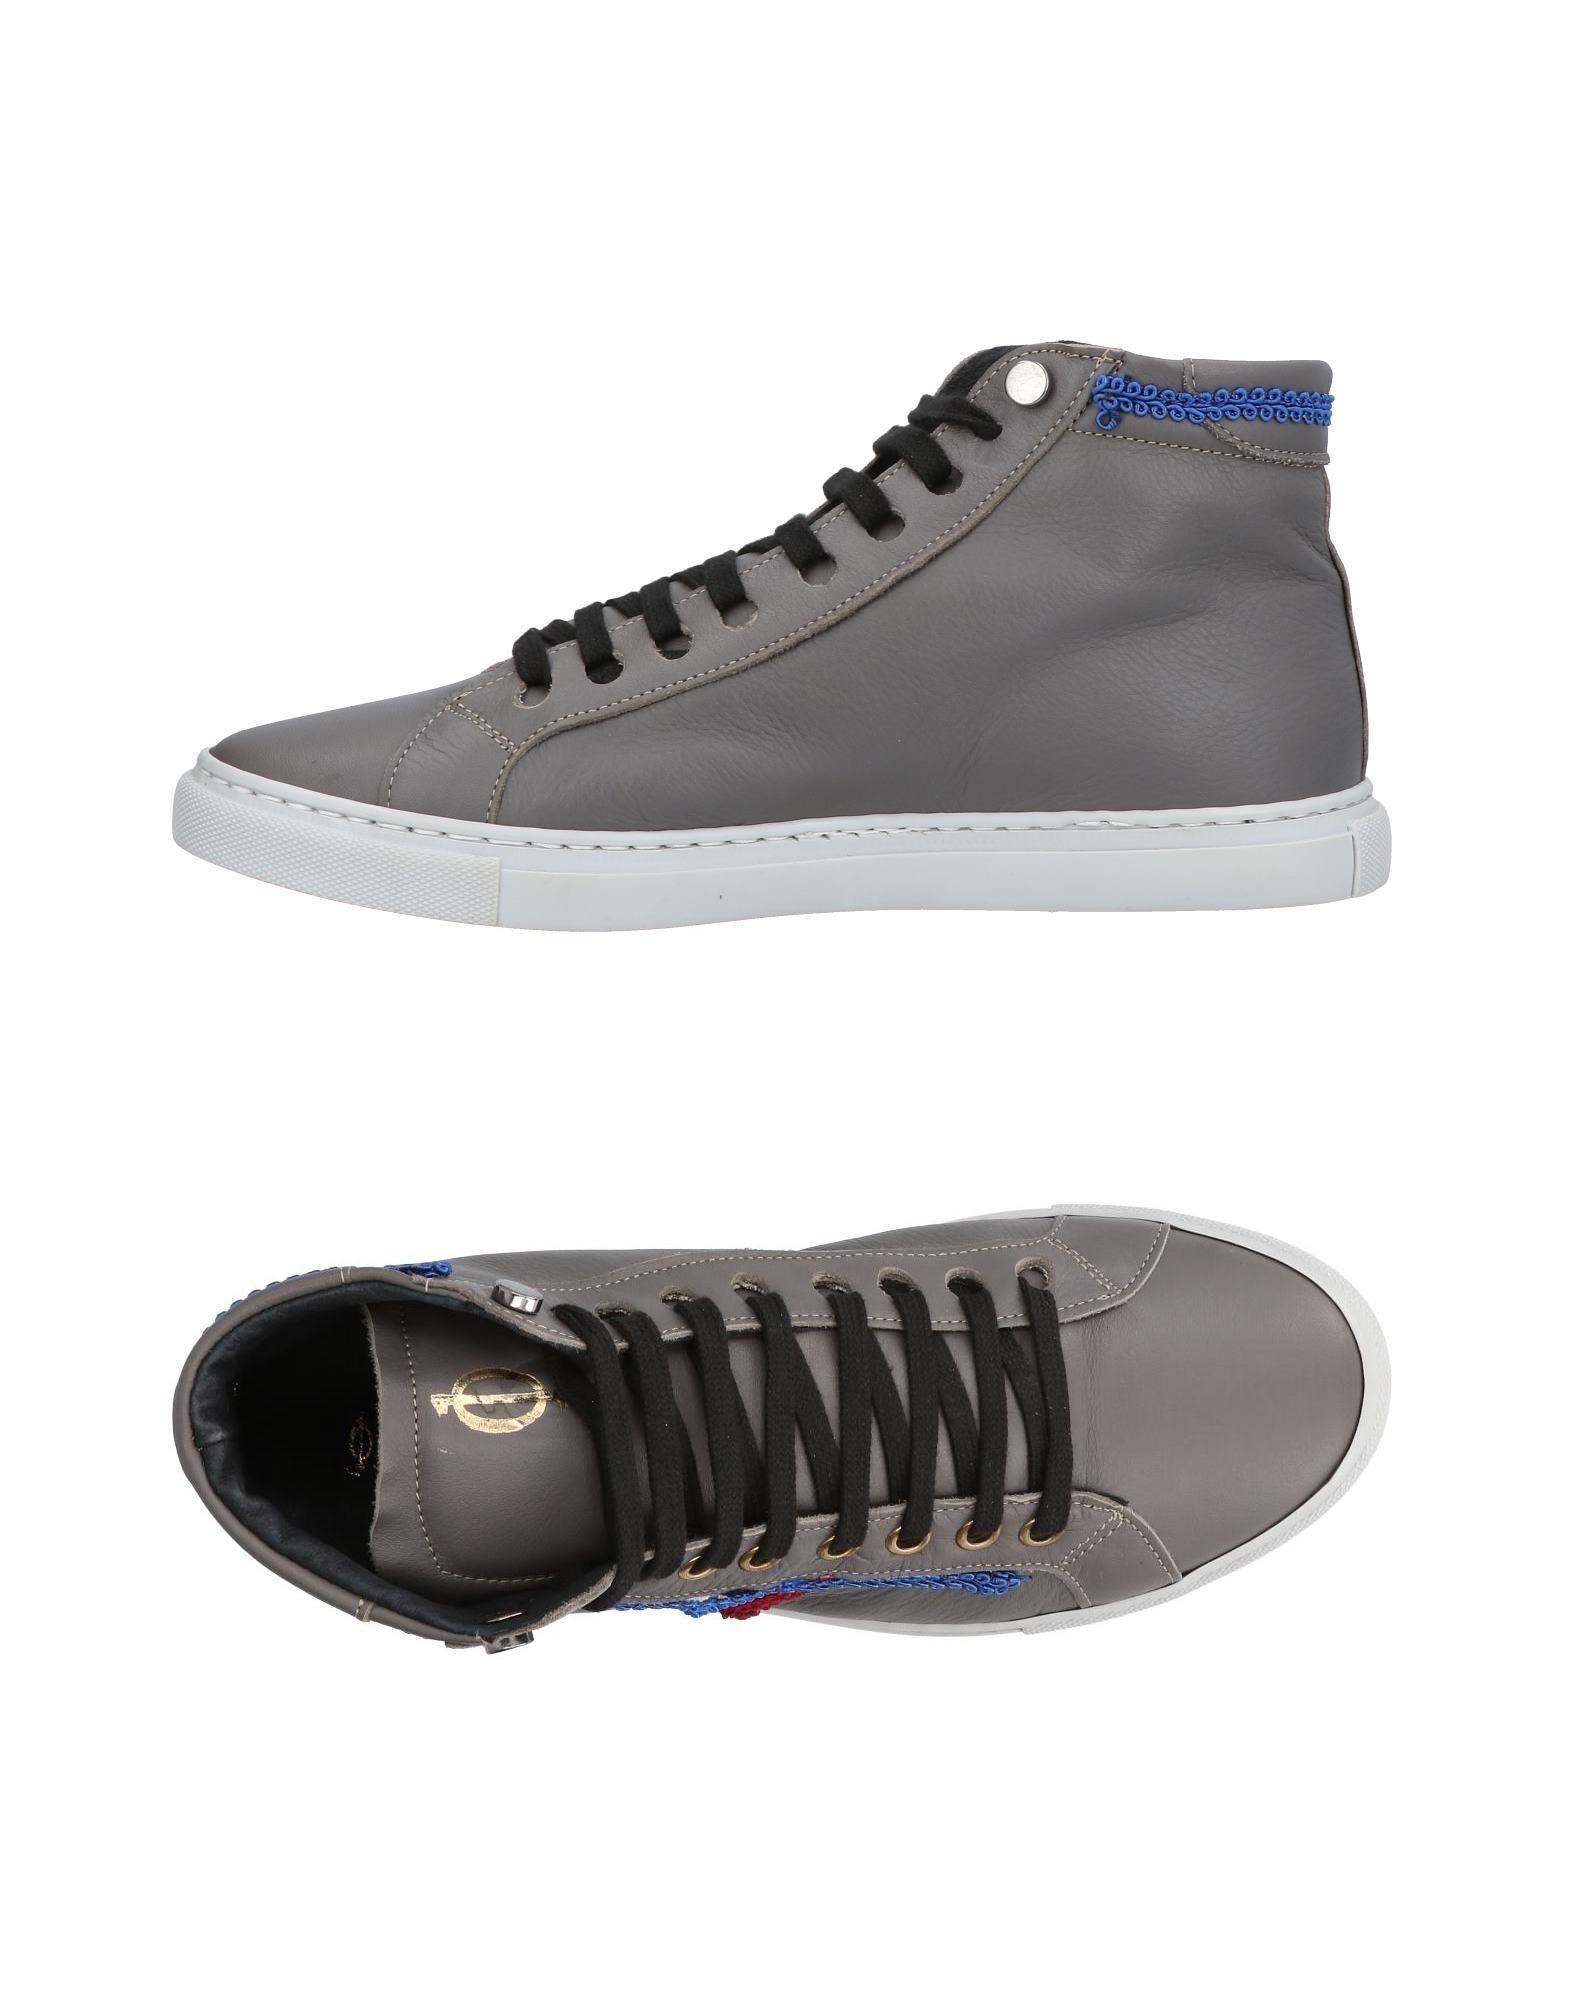 Sneakers One Way Uomo - Acquista online su